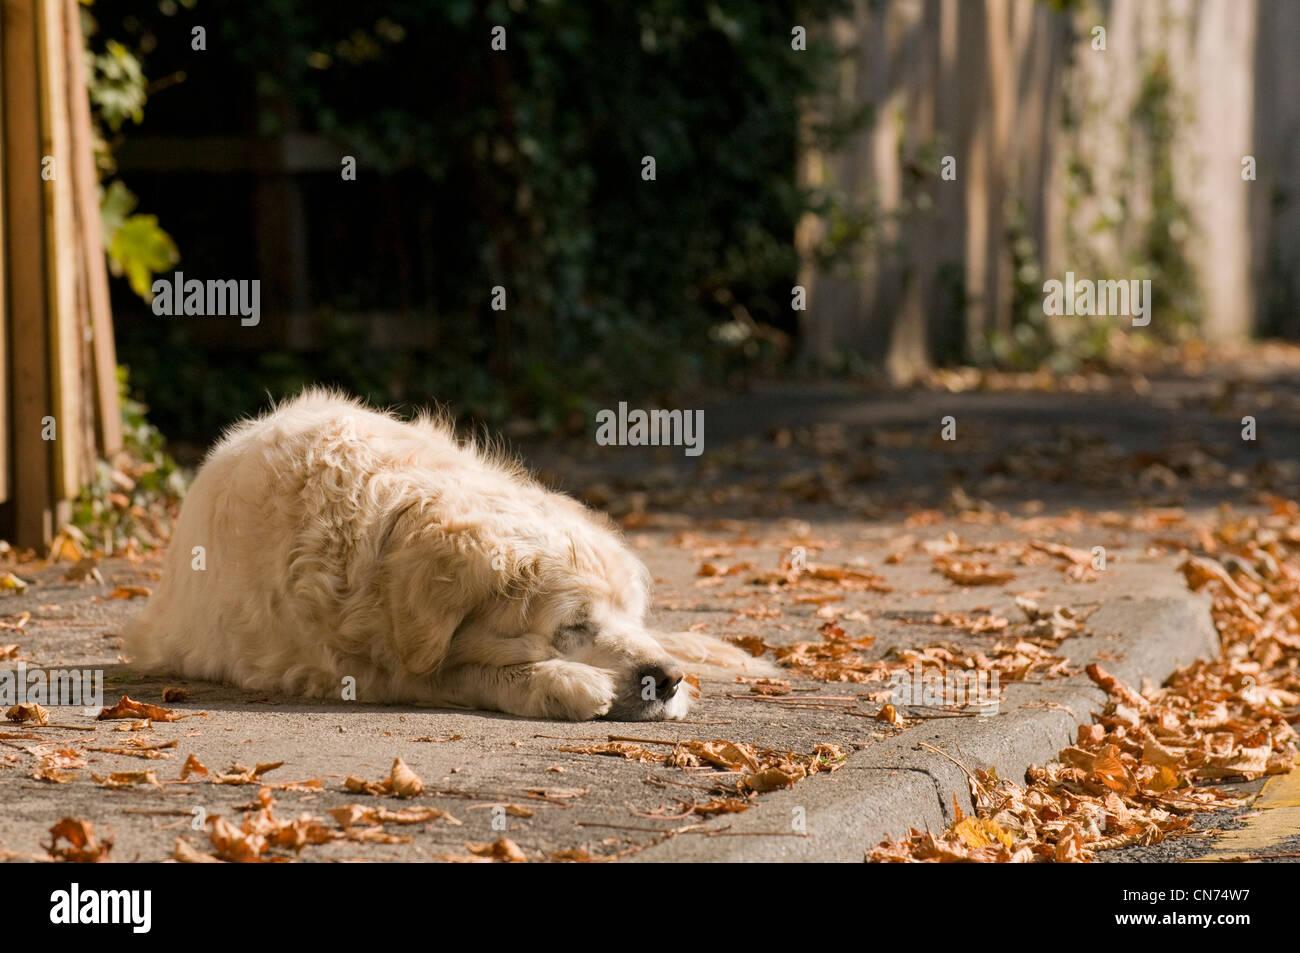 A golden retriever lying across the pavement, fast asleep. - Stock Image